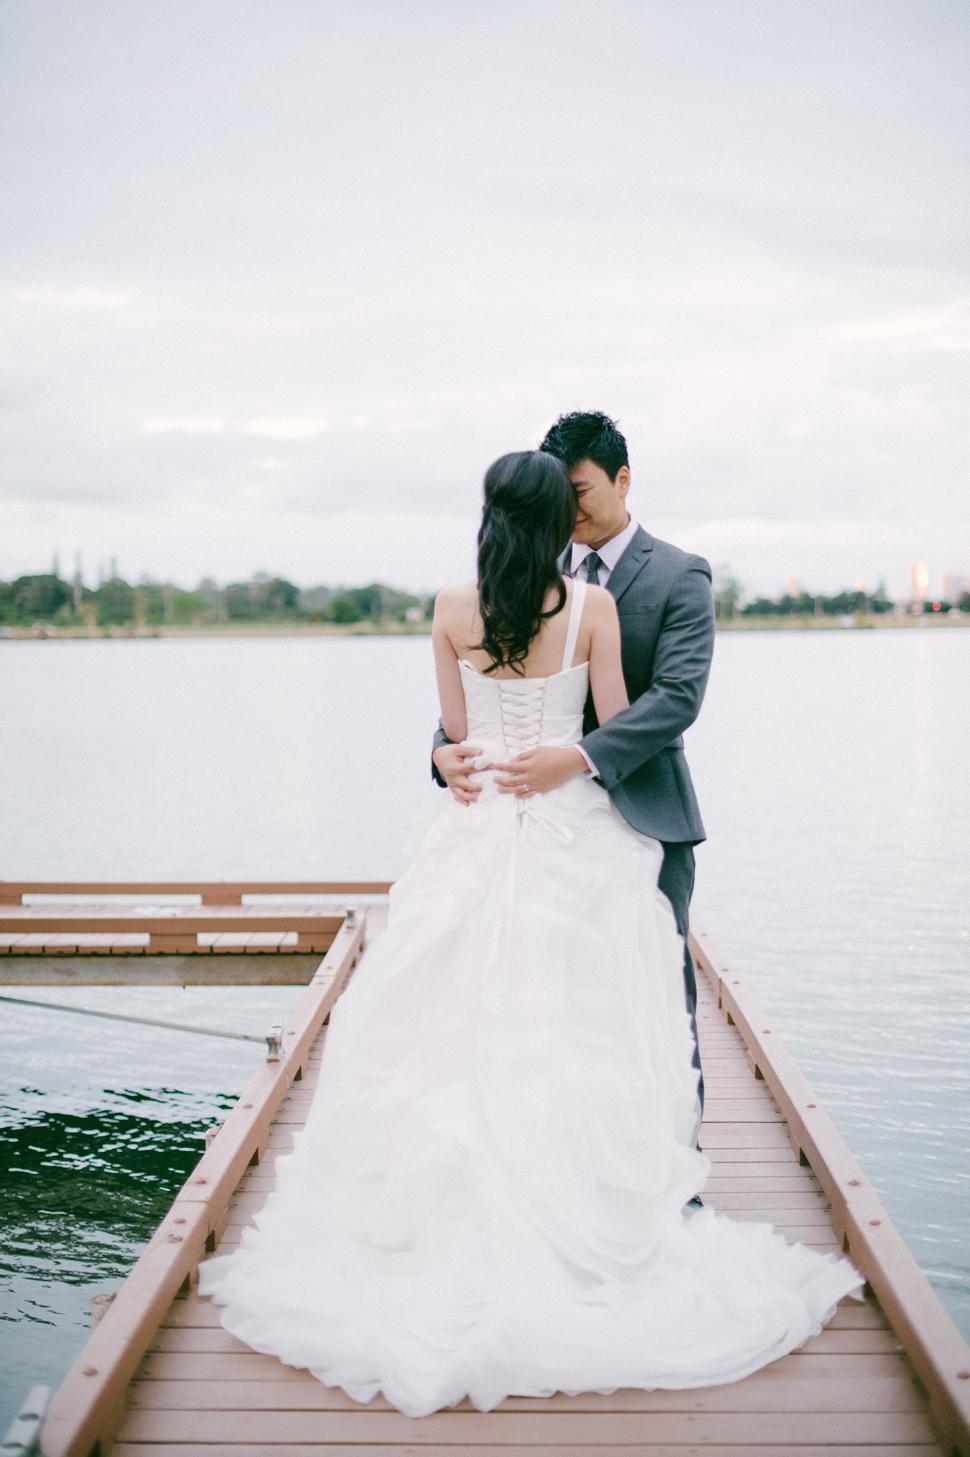 uyen-ron-wedding-emerald-lakes-gold-coast-photographer031